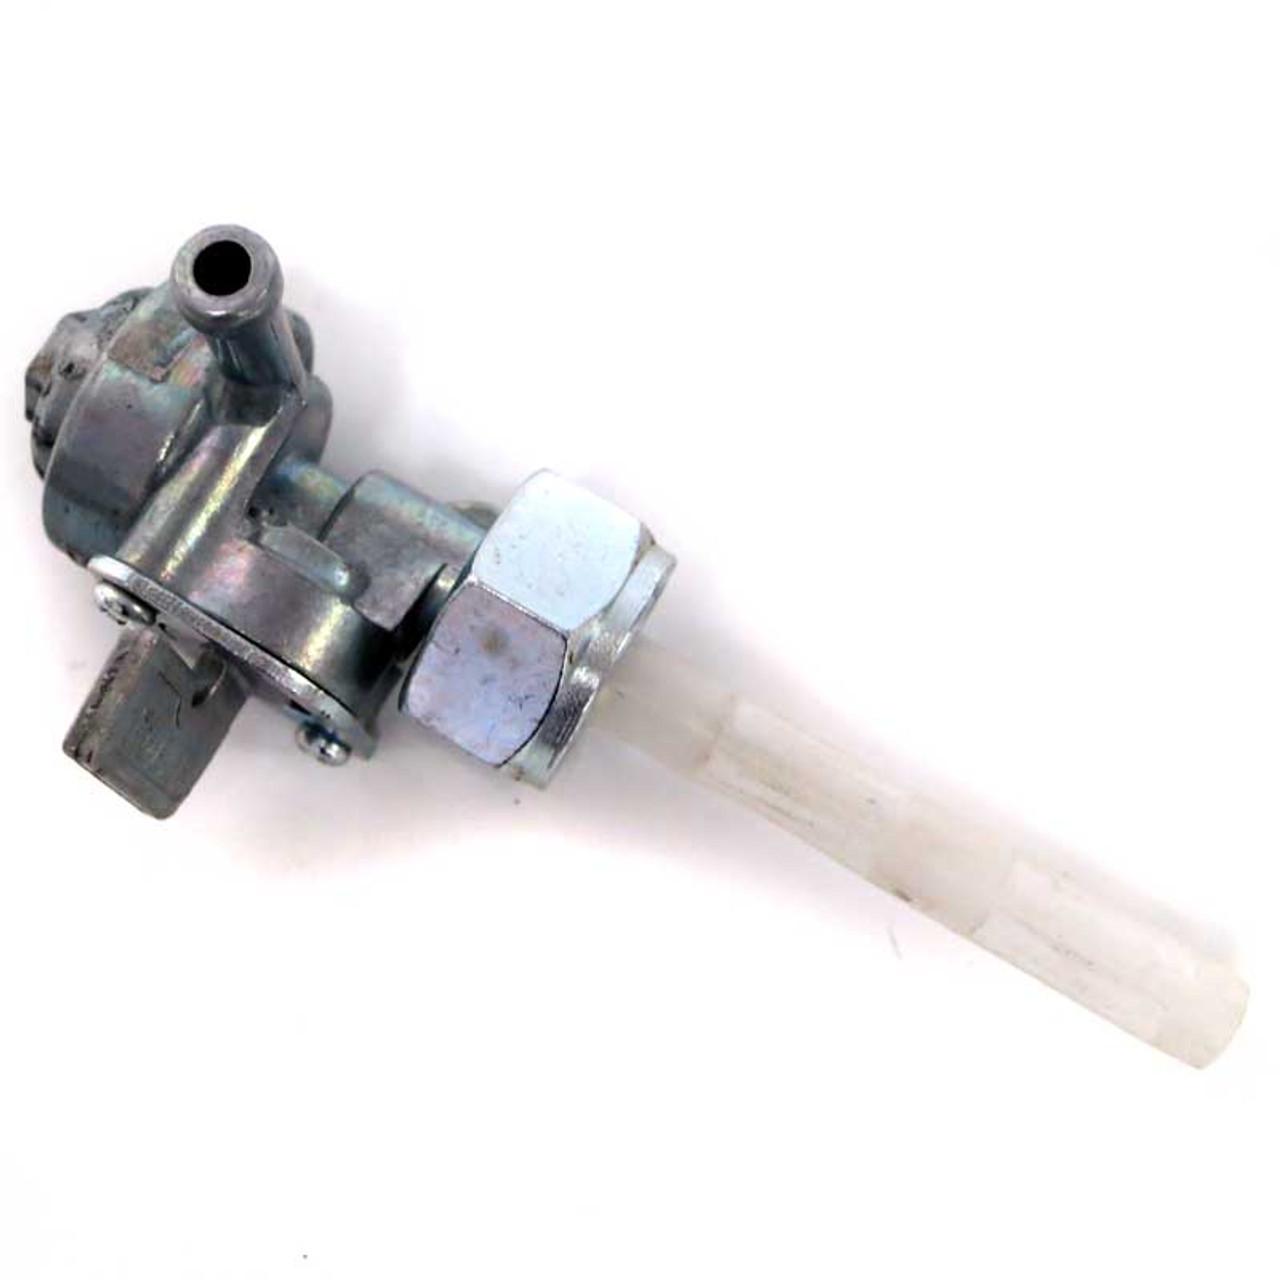 Generac 0J0974 Fuel Valve Shutoff